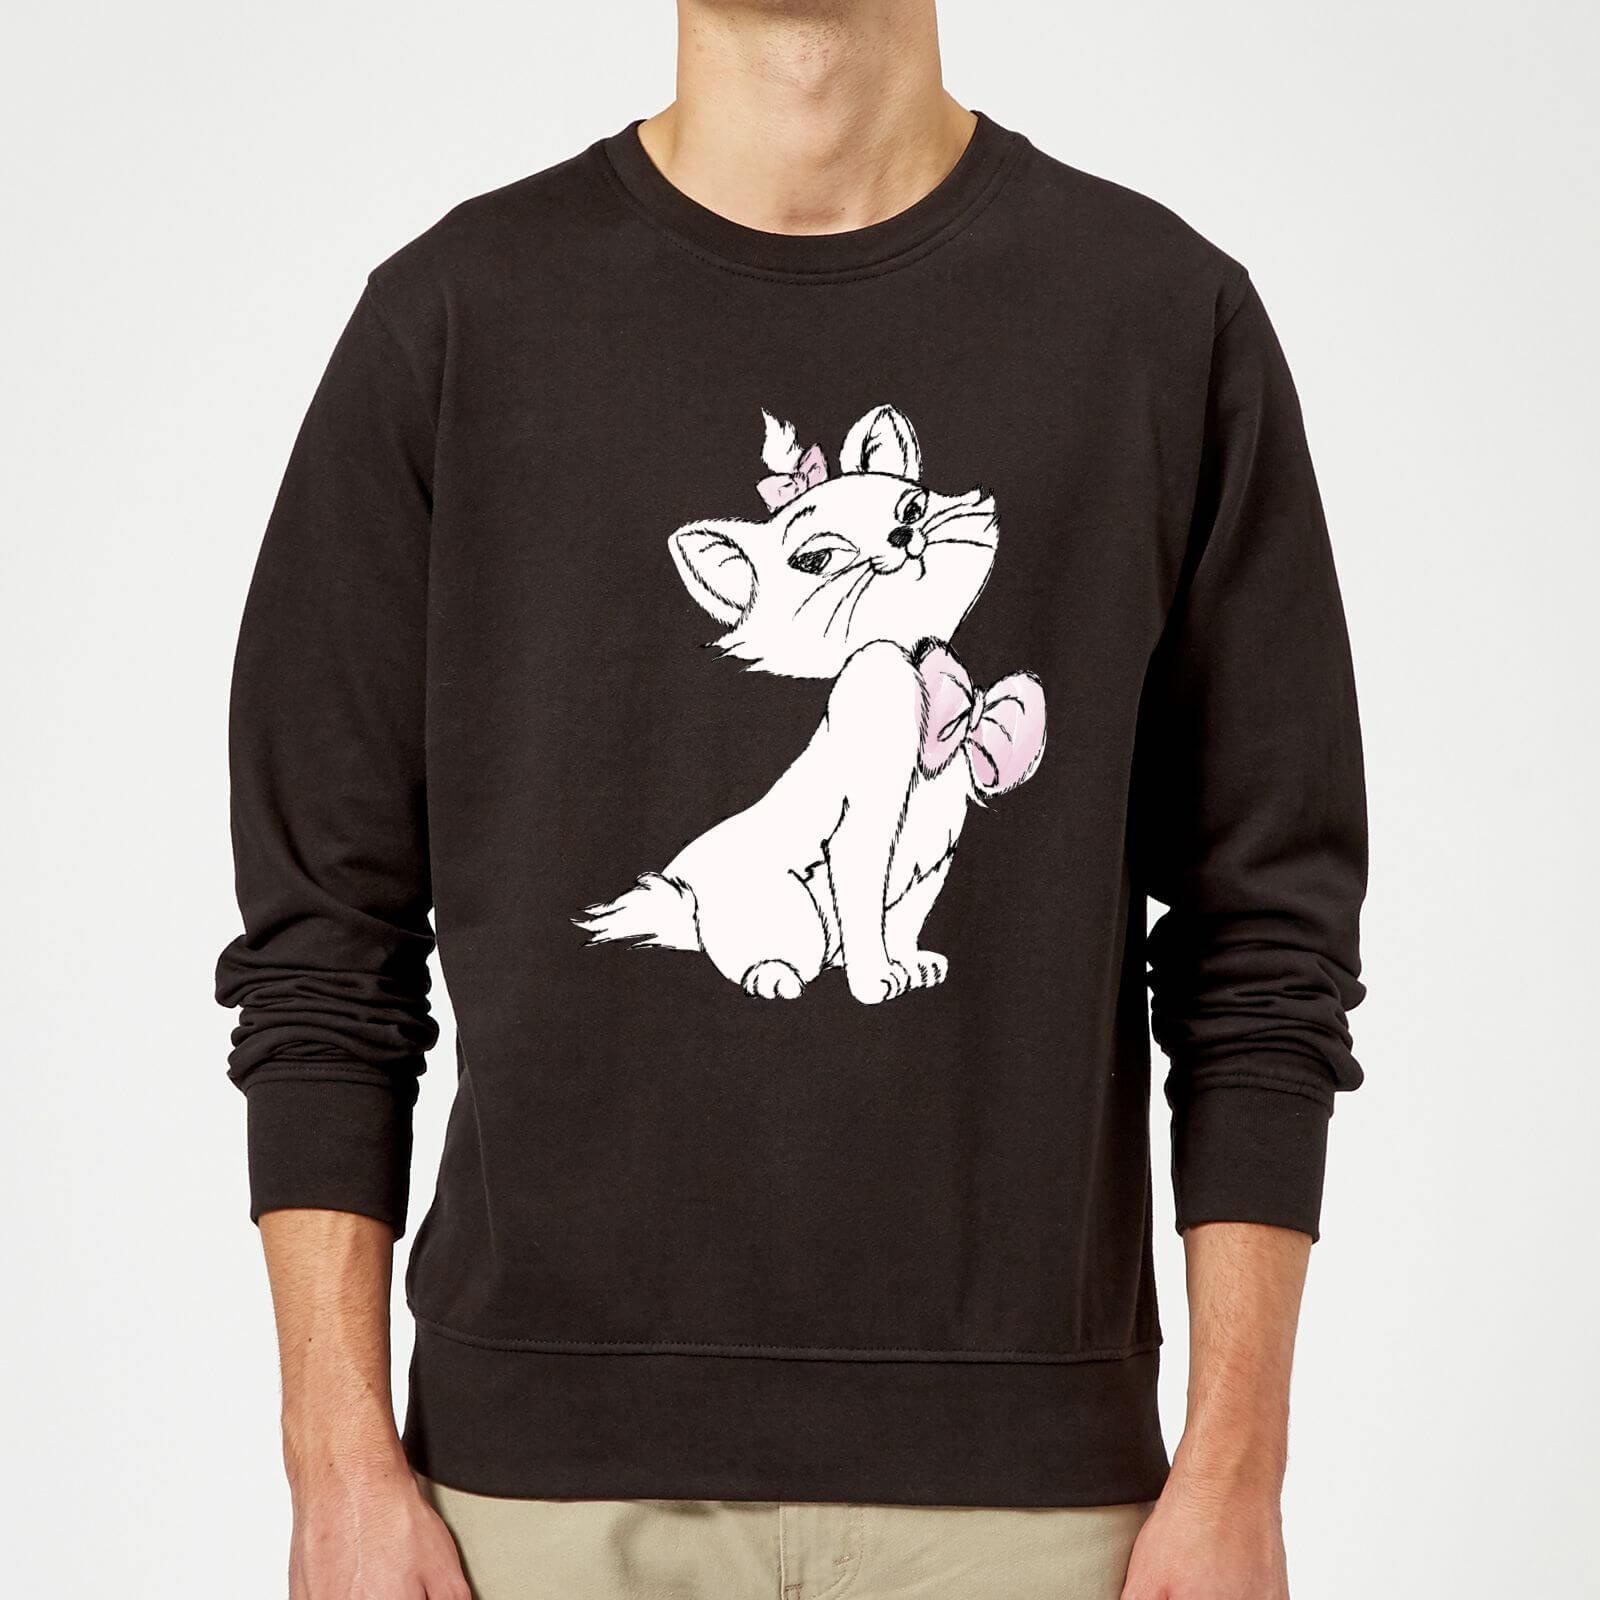 Disney Disney Aristocats Marie Sweatshirt - Black - 5XL - Black